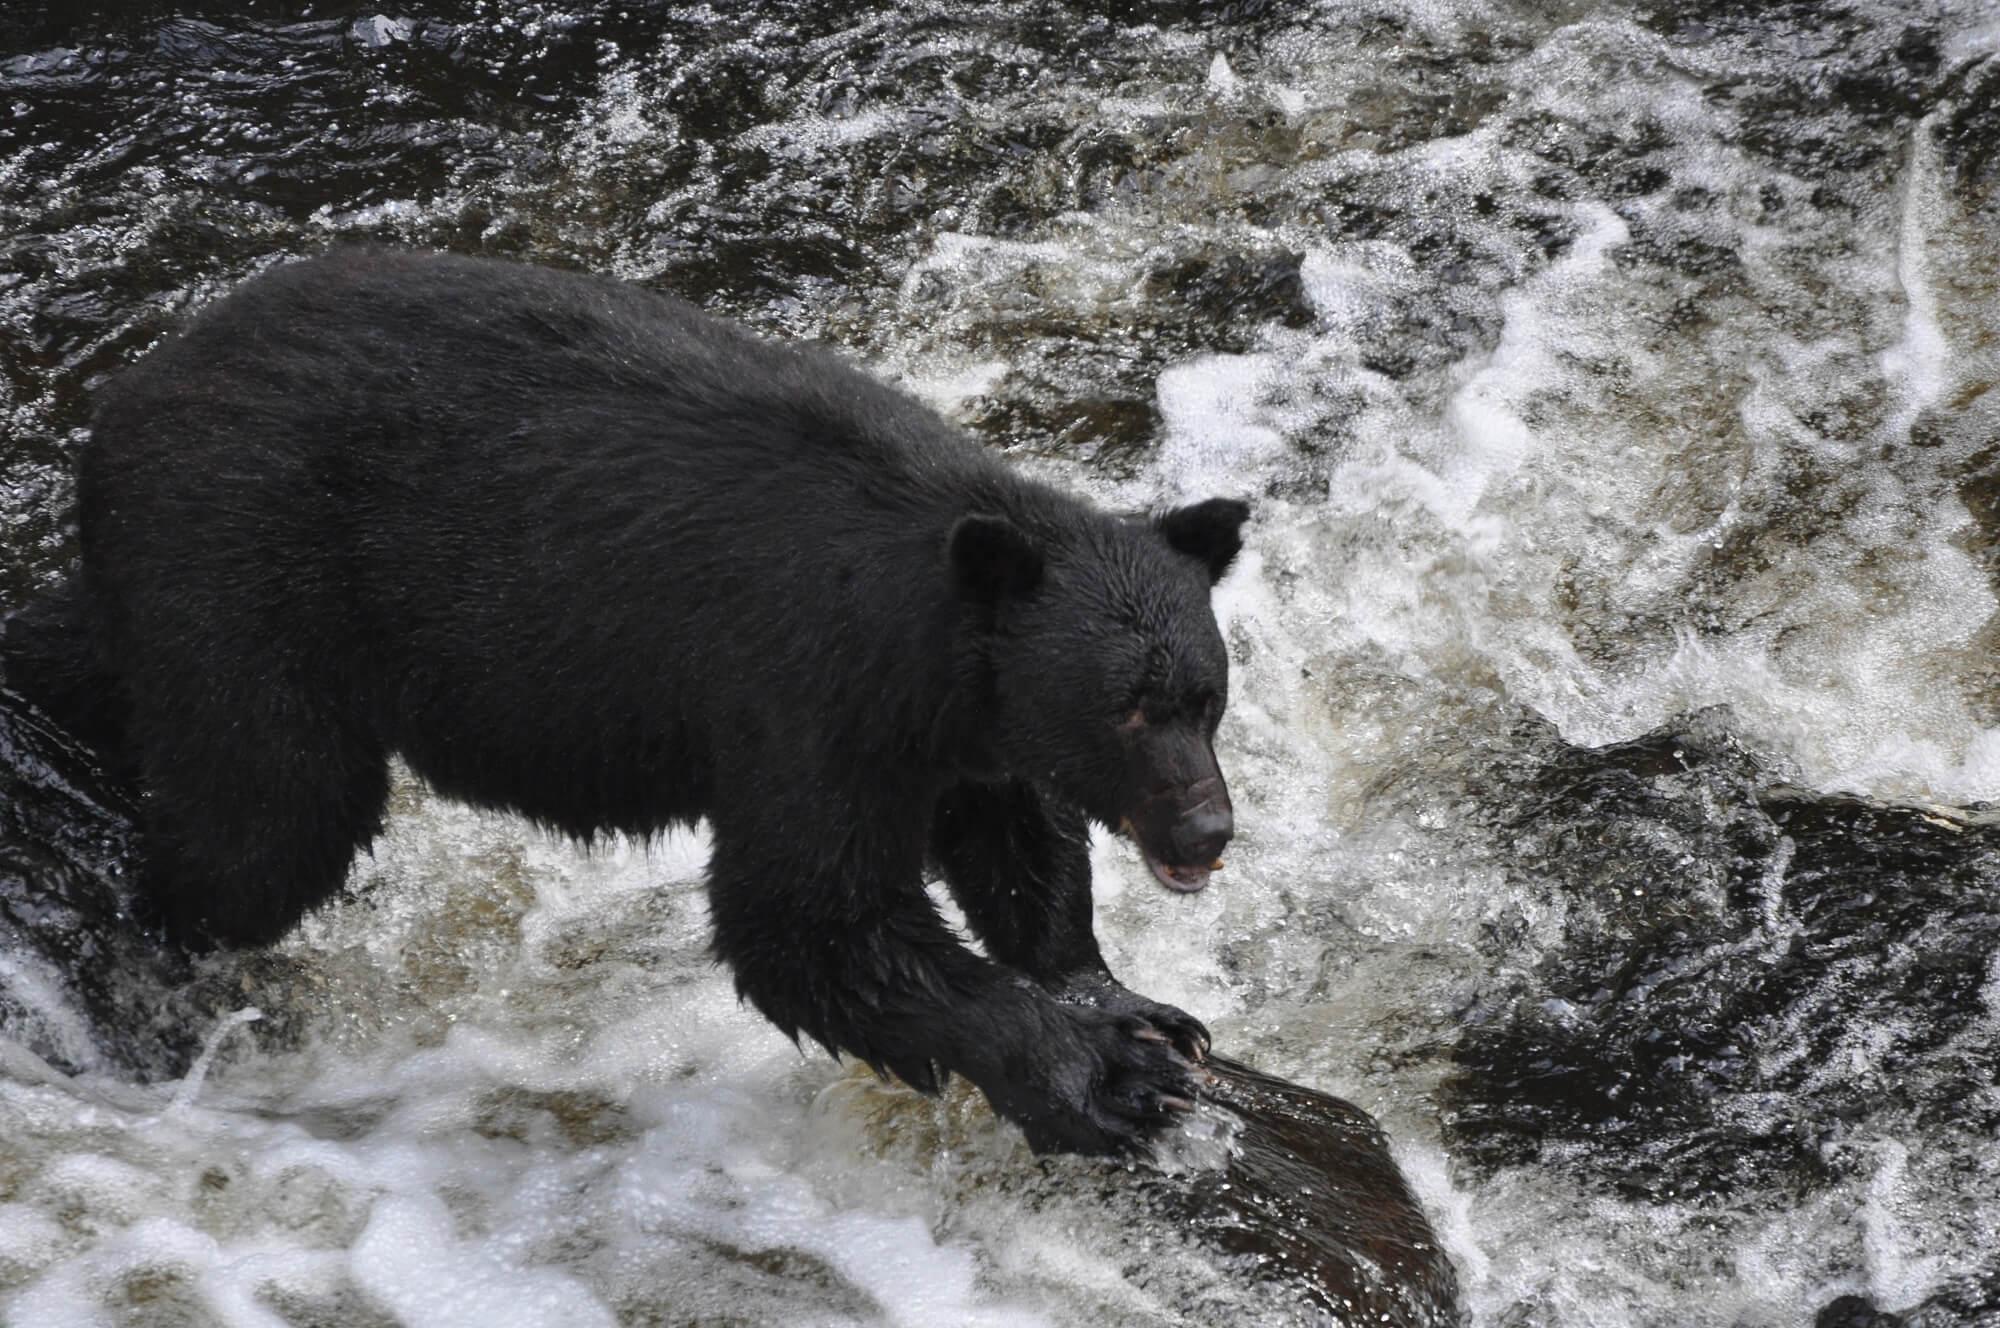 https://www.kawanti.com/wp-content/uploads/2018/10/Alaska-Bear-Black-Bear-on-rock-in-rapids.jpg